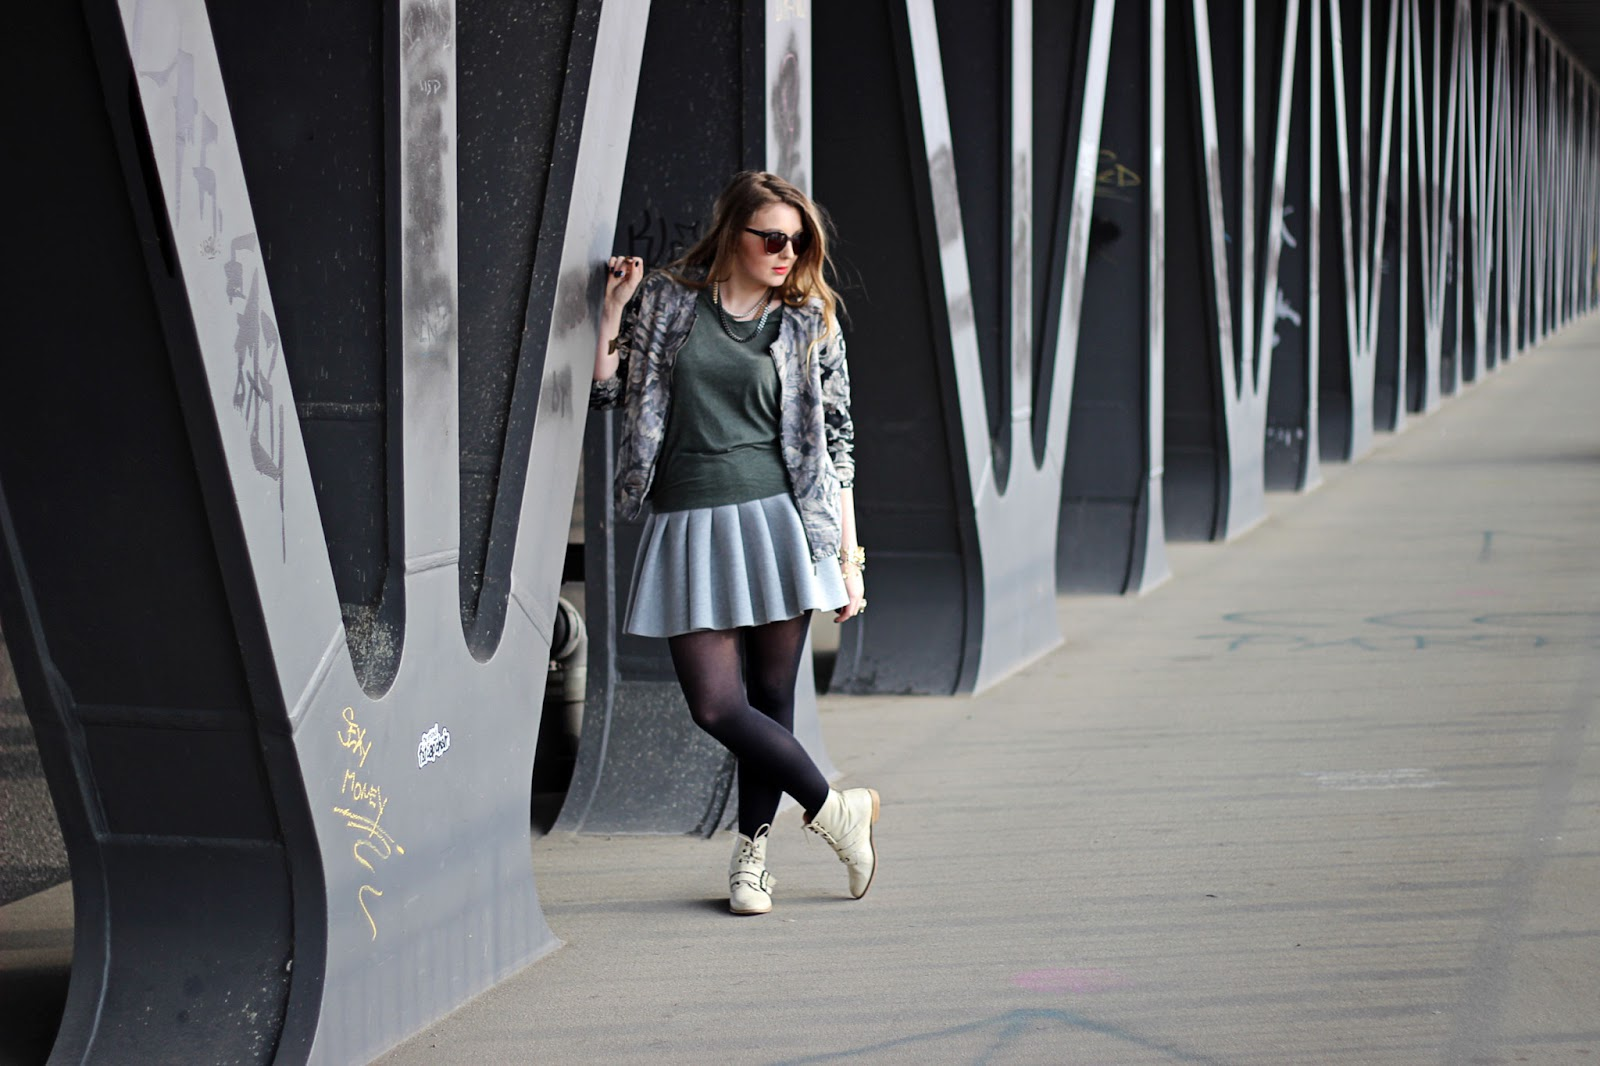 H&M Palmenprint Blouson, collegejacke, tropical print, Bomber jacke, Neopren rock, scuba skirt, bijou brigitte, kette, gold, grau, gerry weber, sonnebrille, sunnies, modeblogger, hamburg, fashion, germany